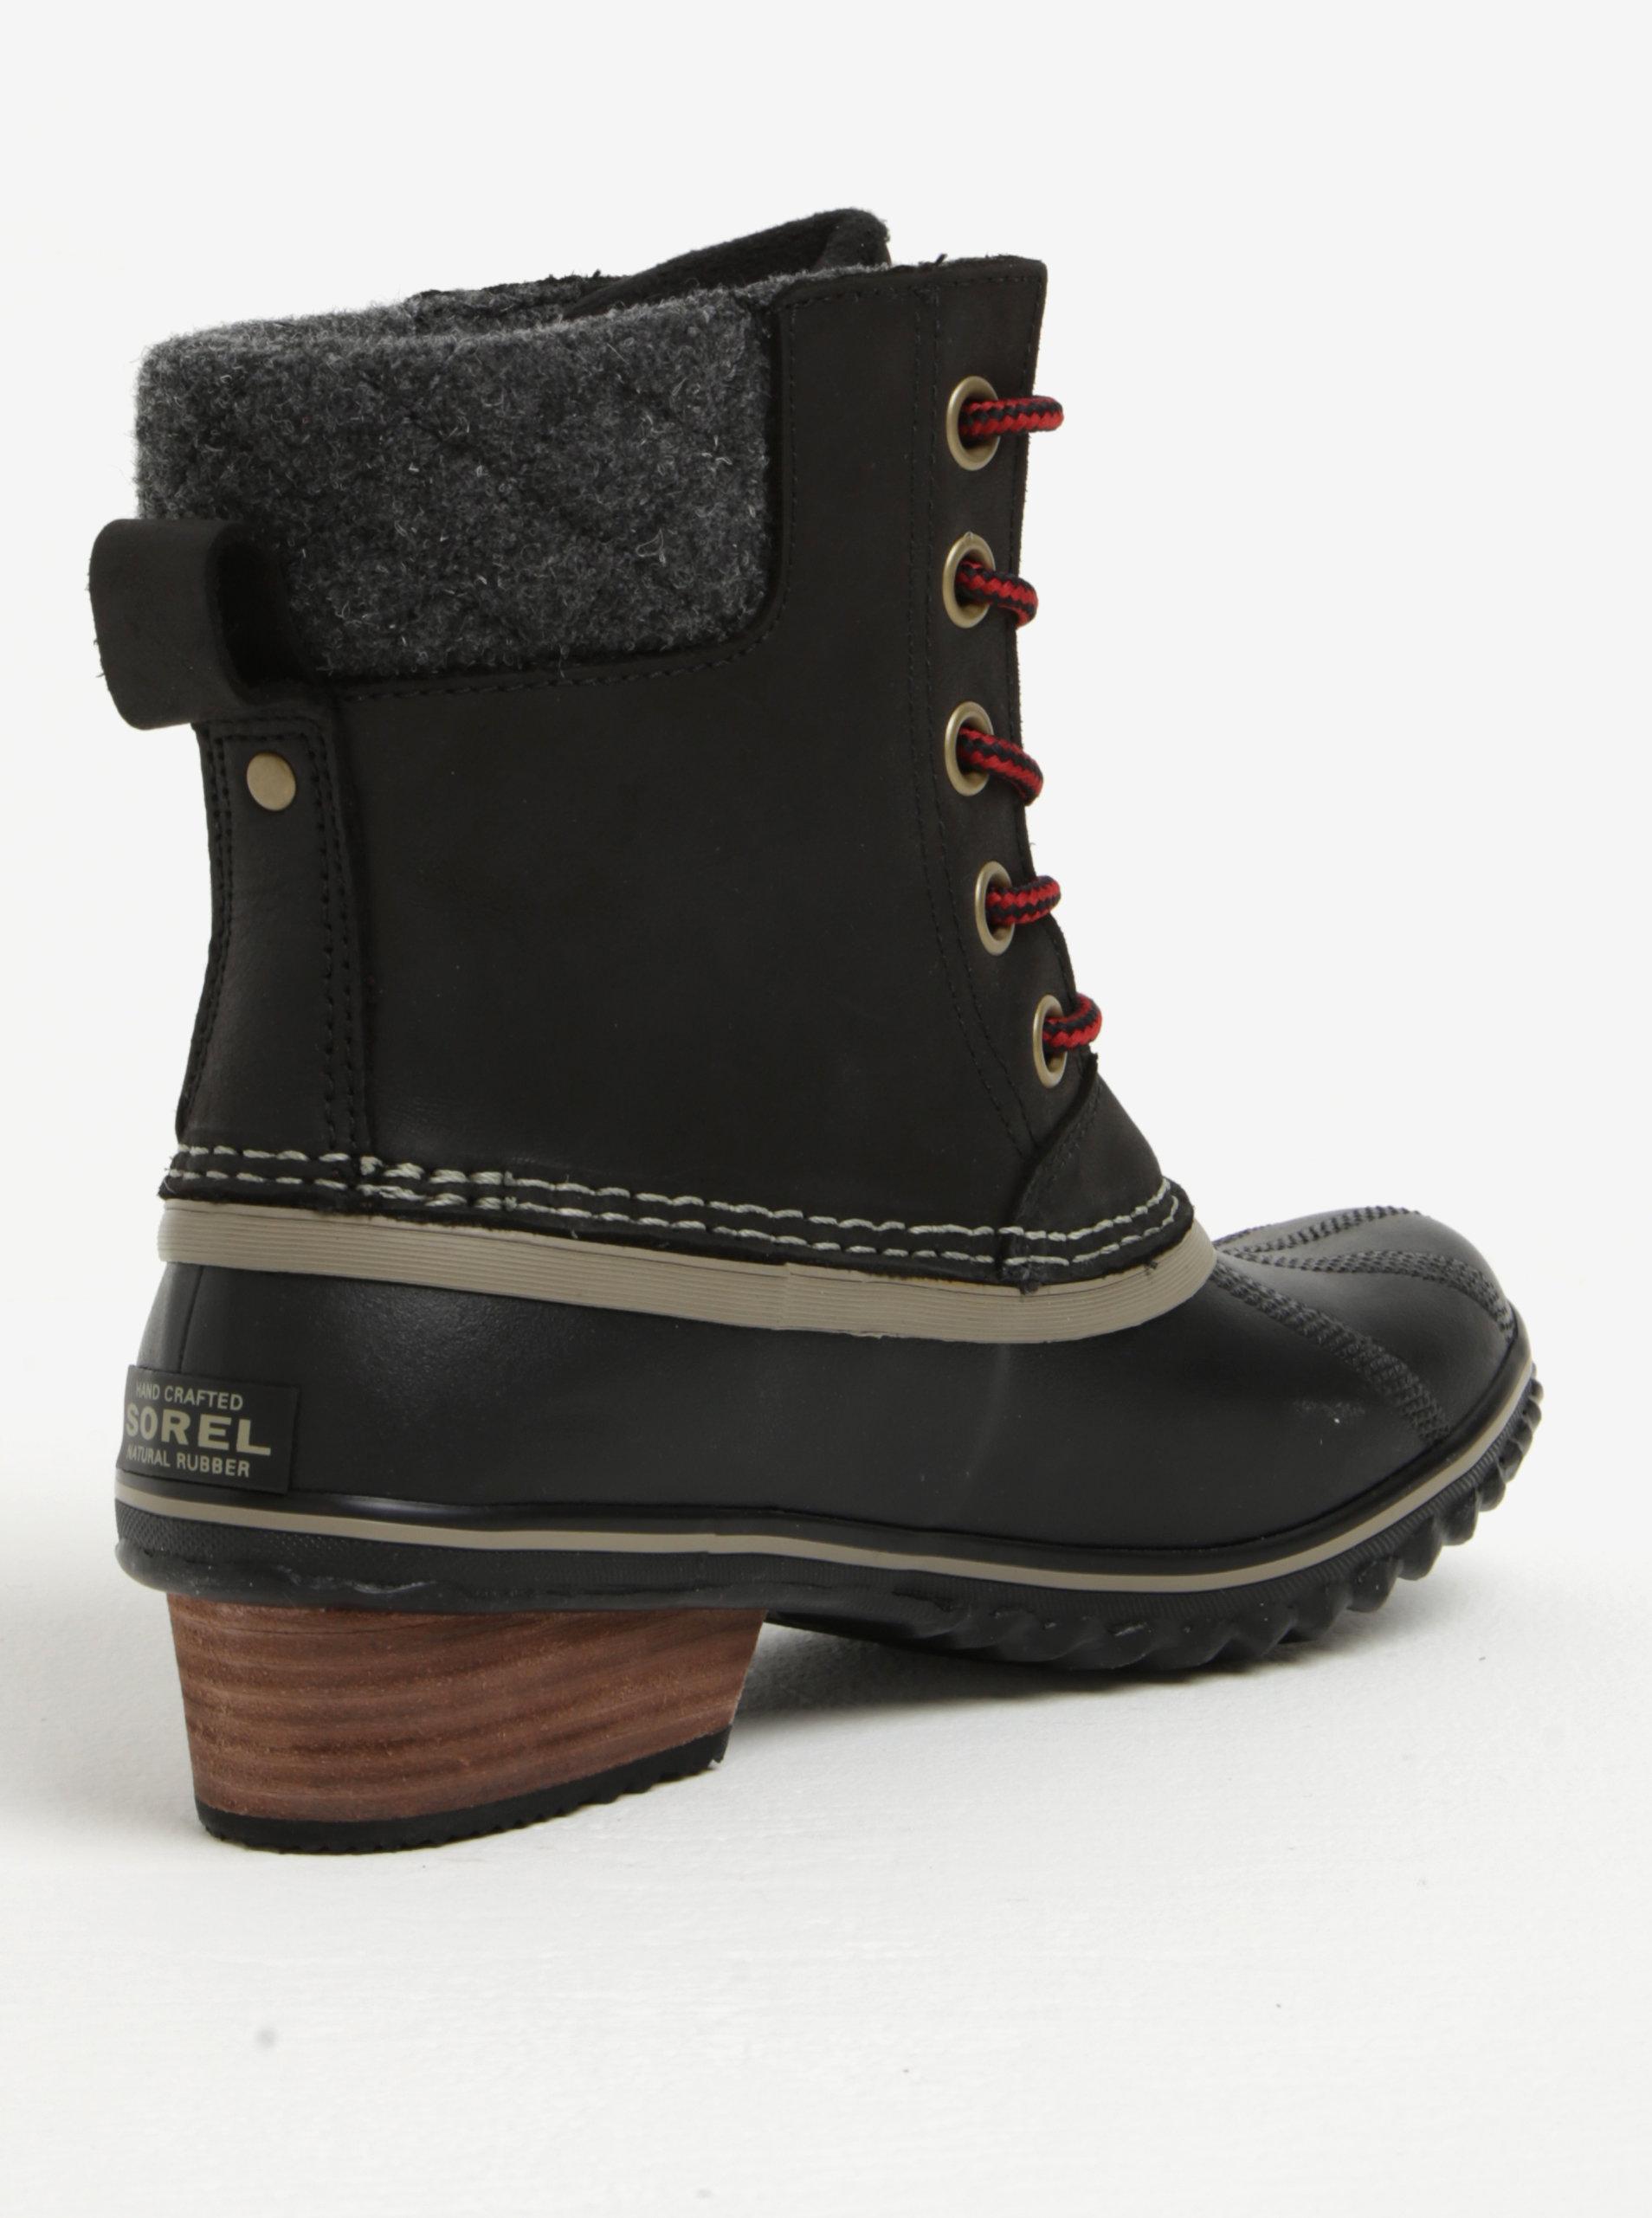 d78b32e44758b Čierne dámske členkové kožené vodovzdorné zimné topánky na nízkom podpätku  SOREL ...